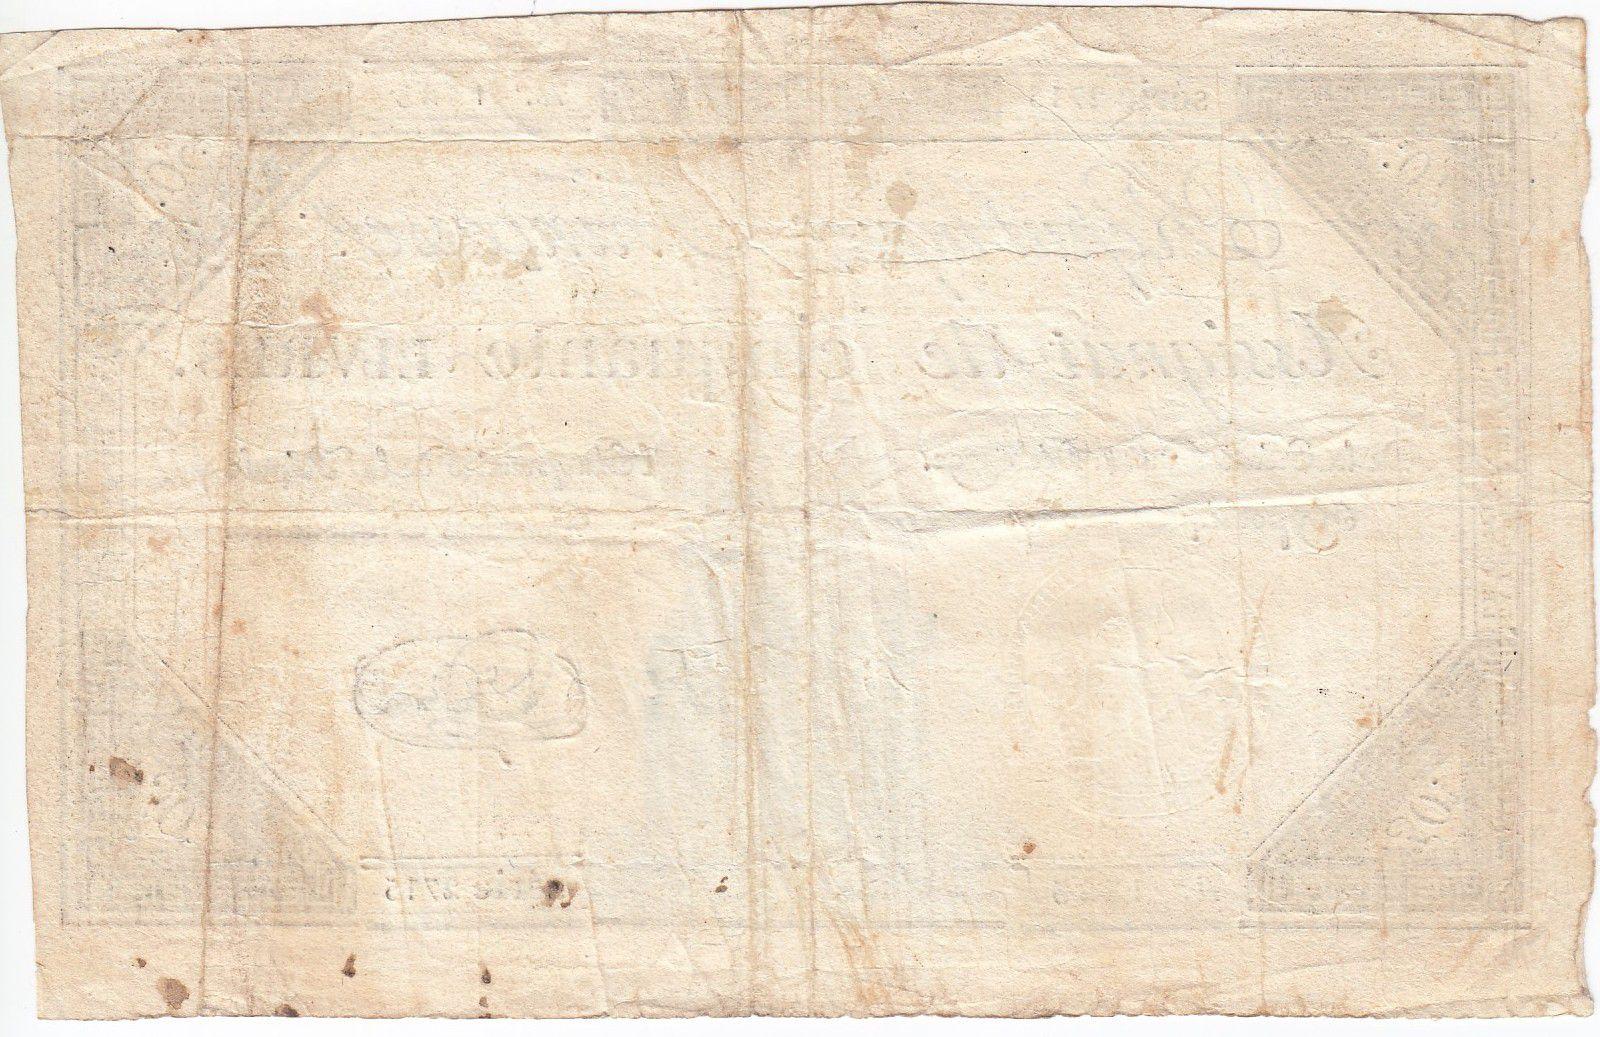 France 50 Livres France seated - 14-12-1792 - Sign. Le Brun - VF